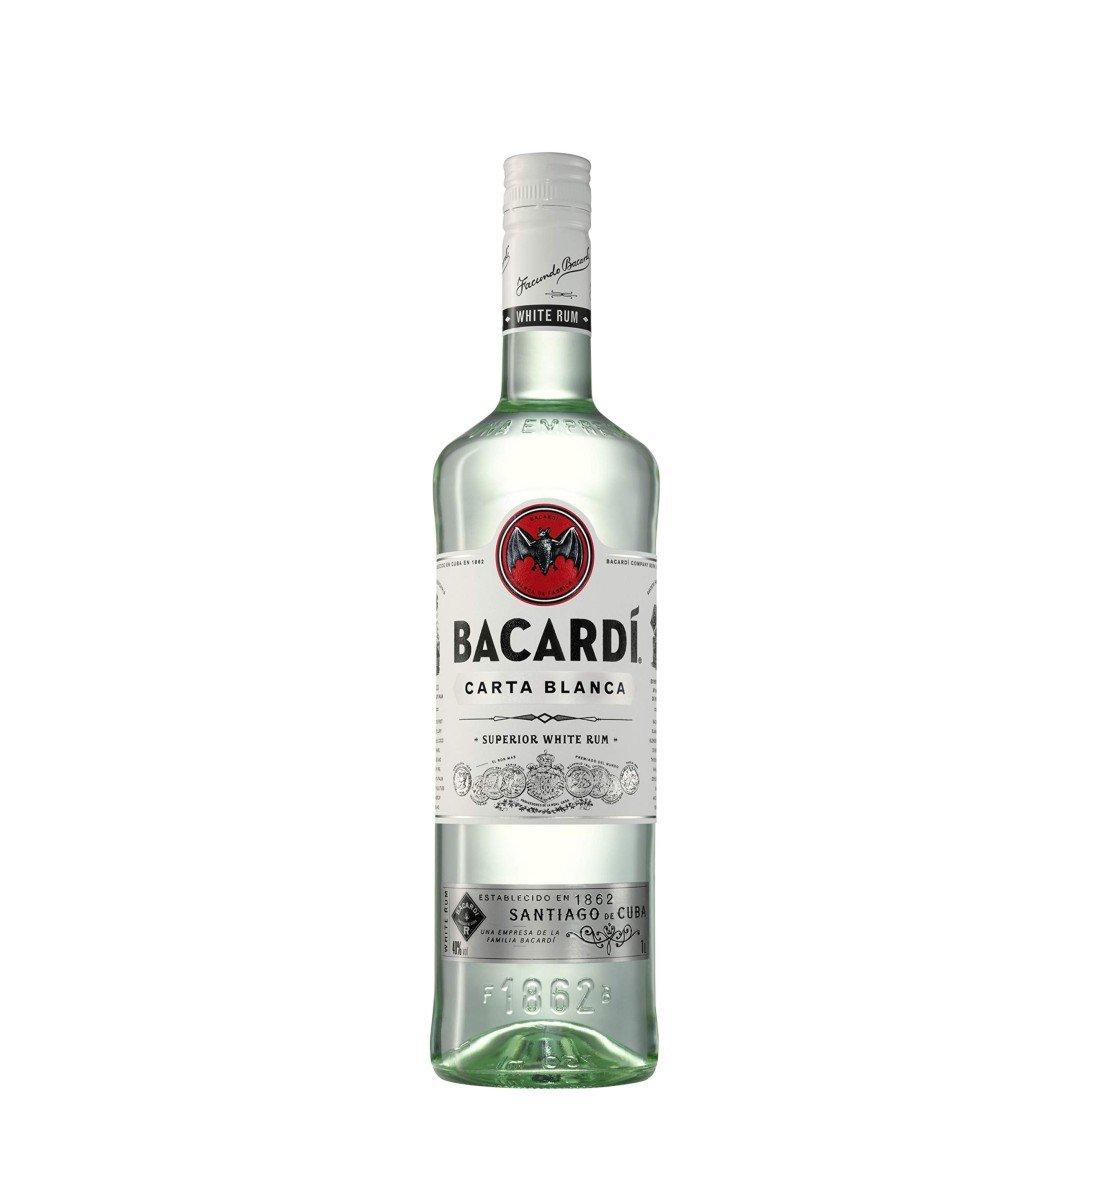 Bacardi Carta Blanca 1L